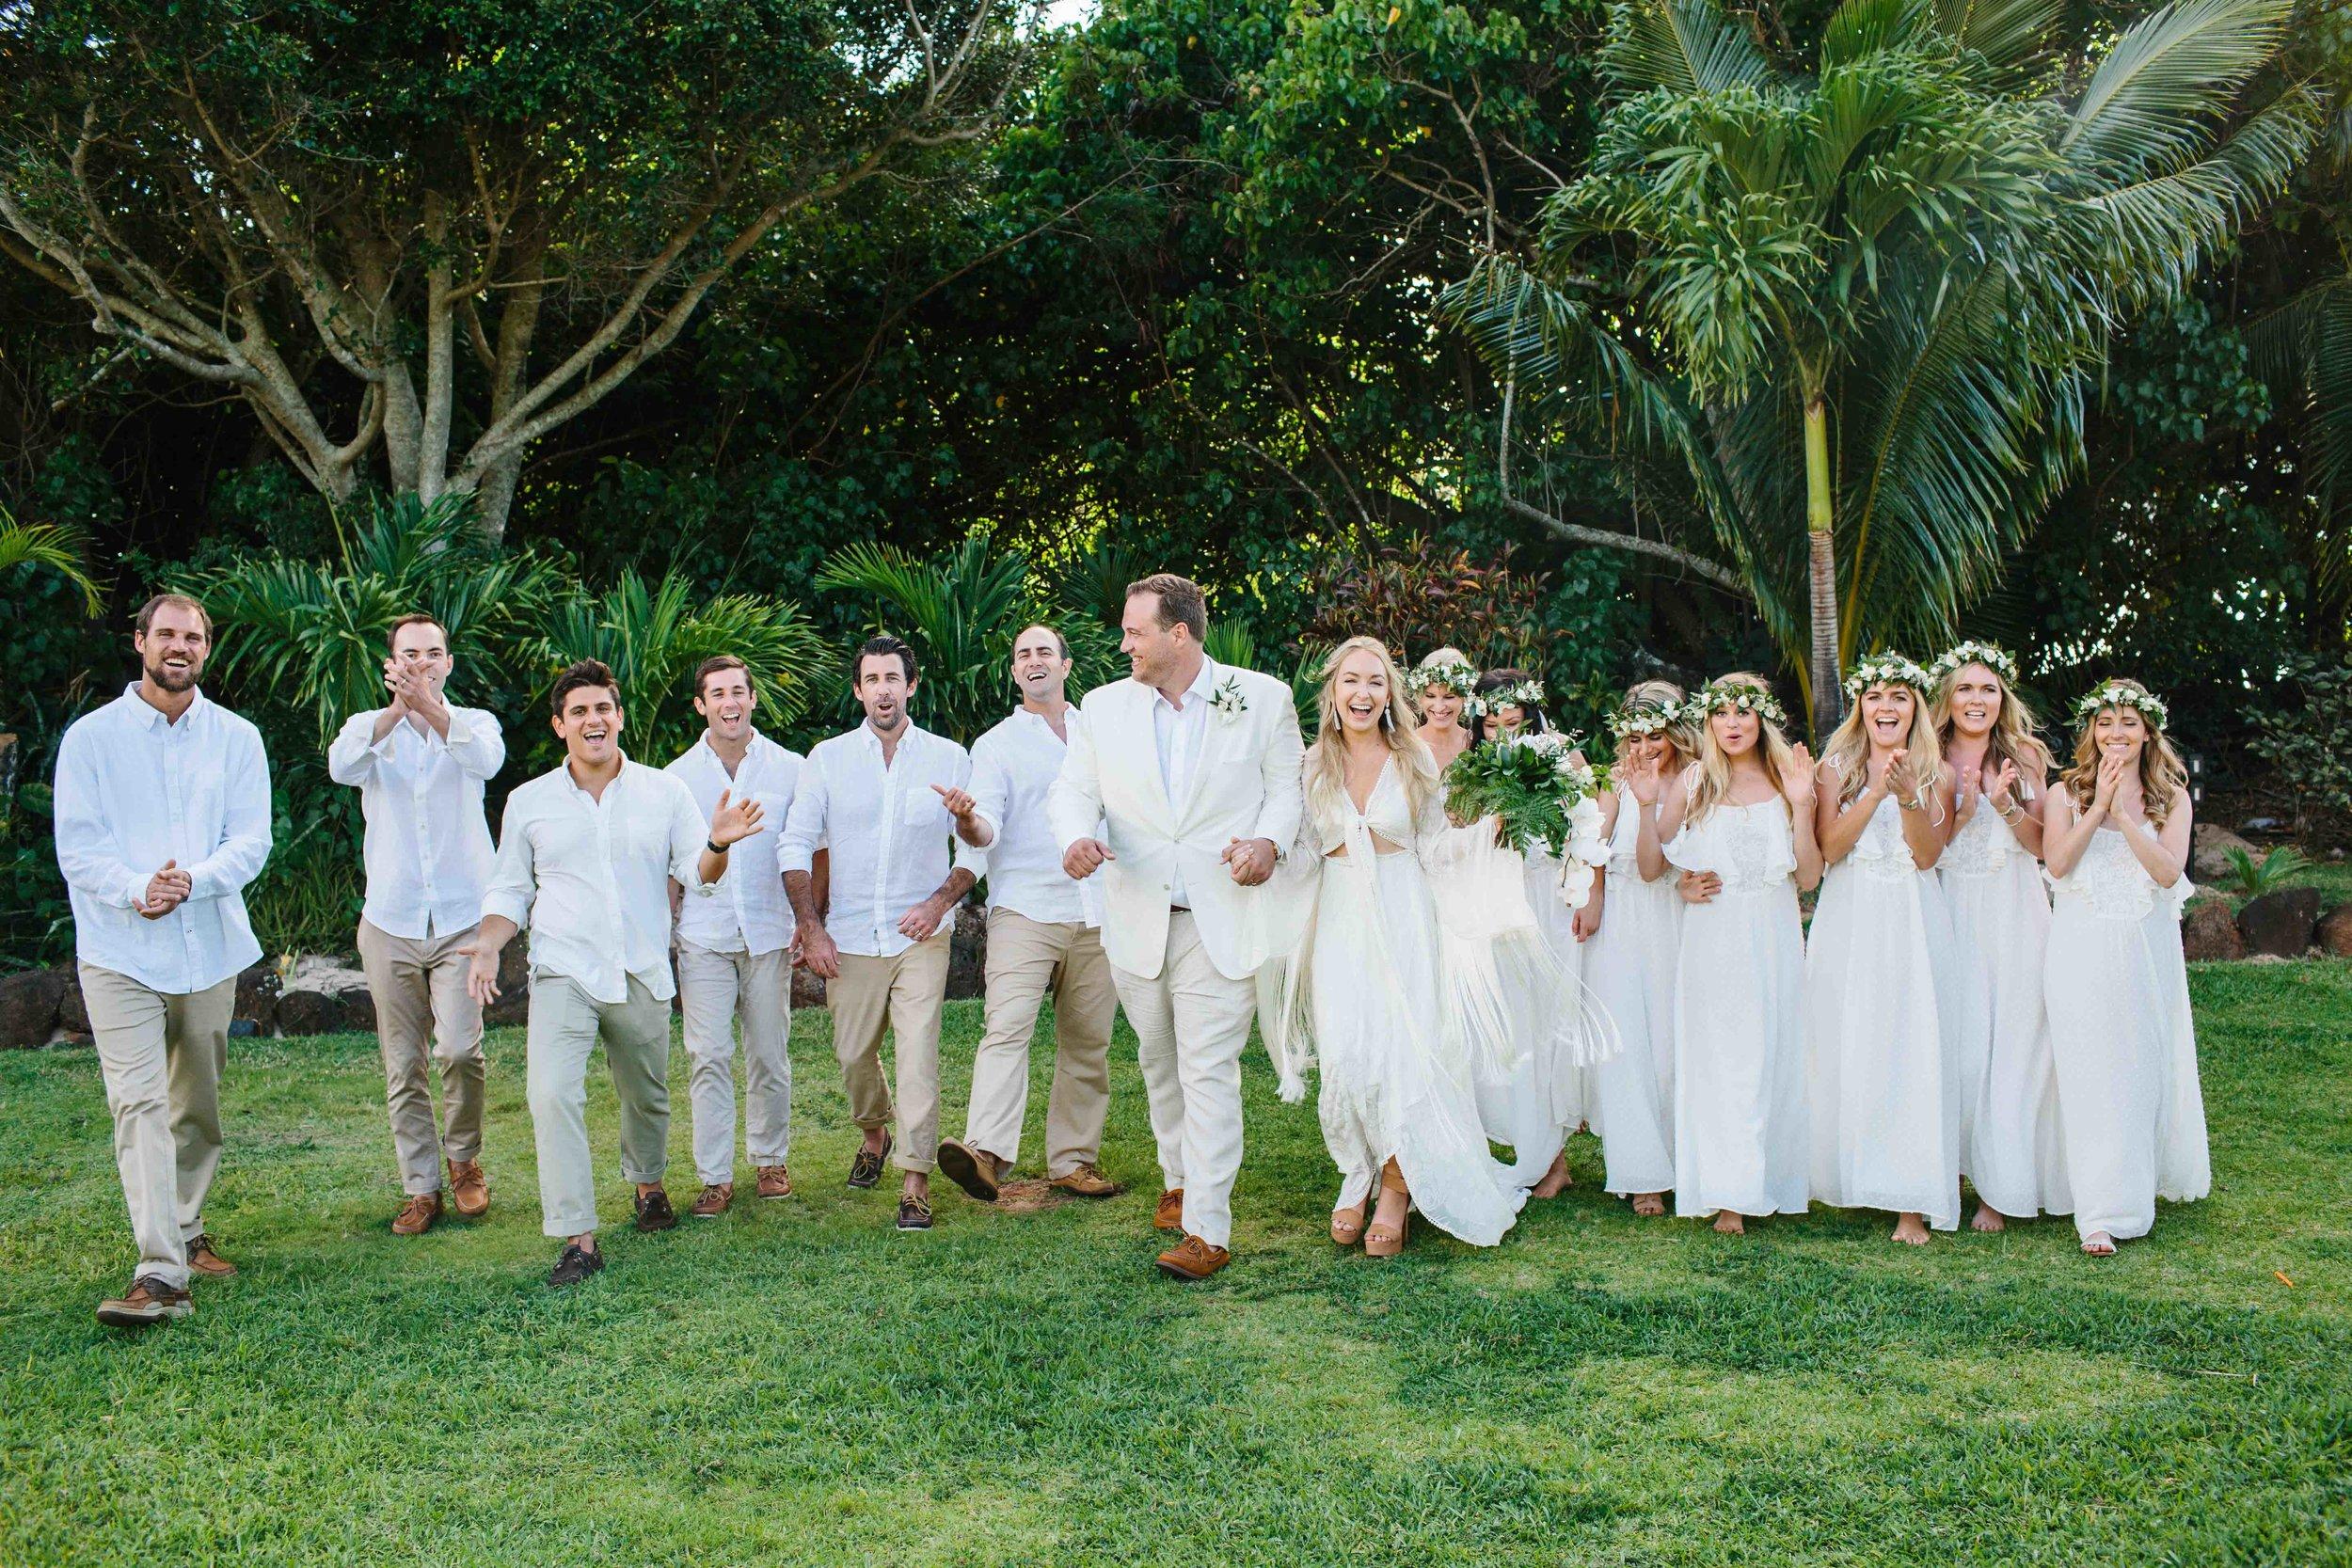 All White Bridal Party at a Bohemian Wedding